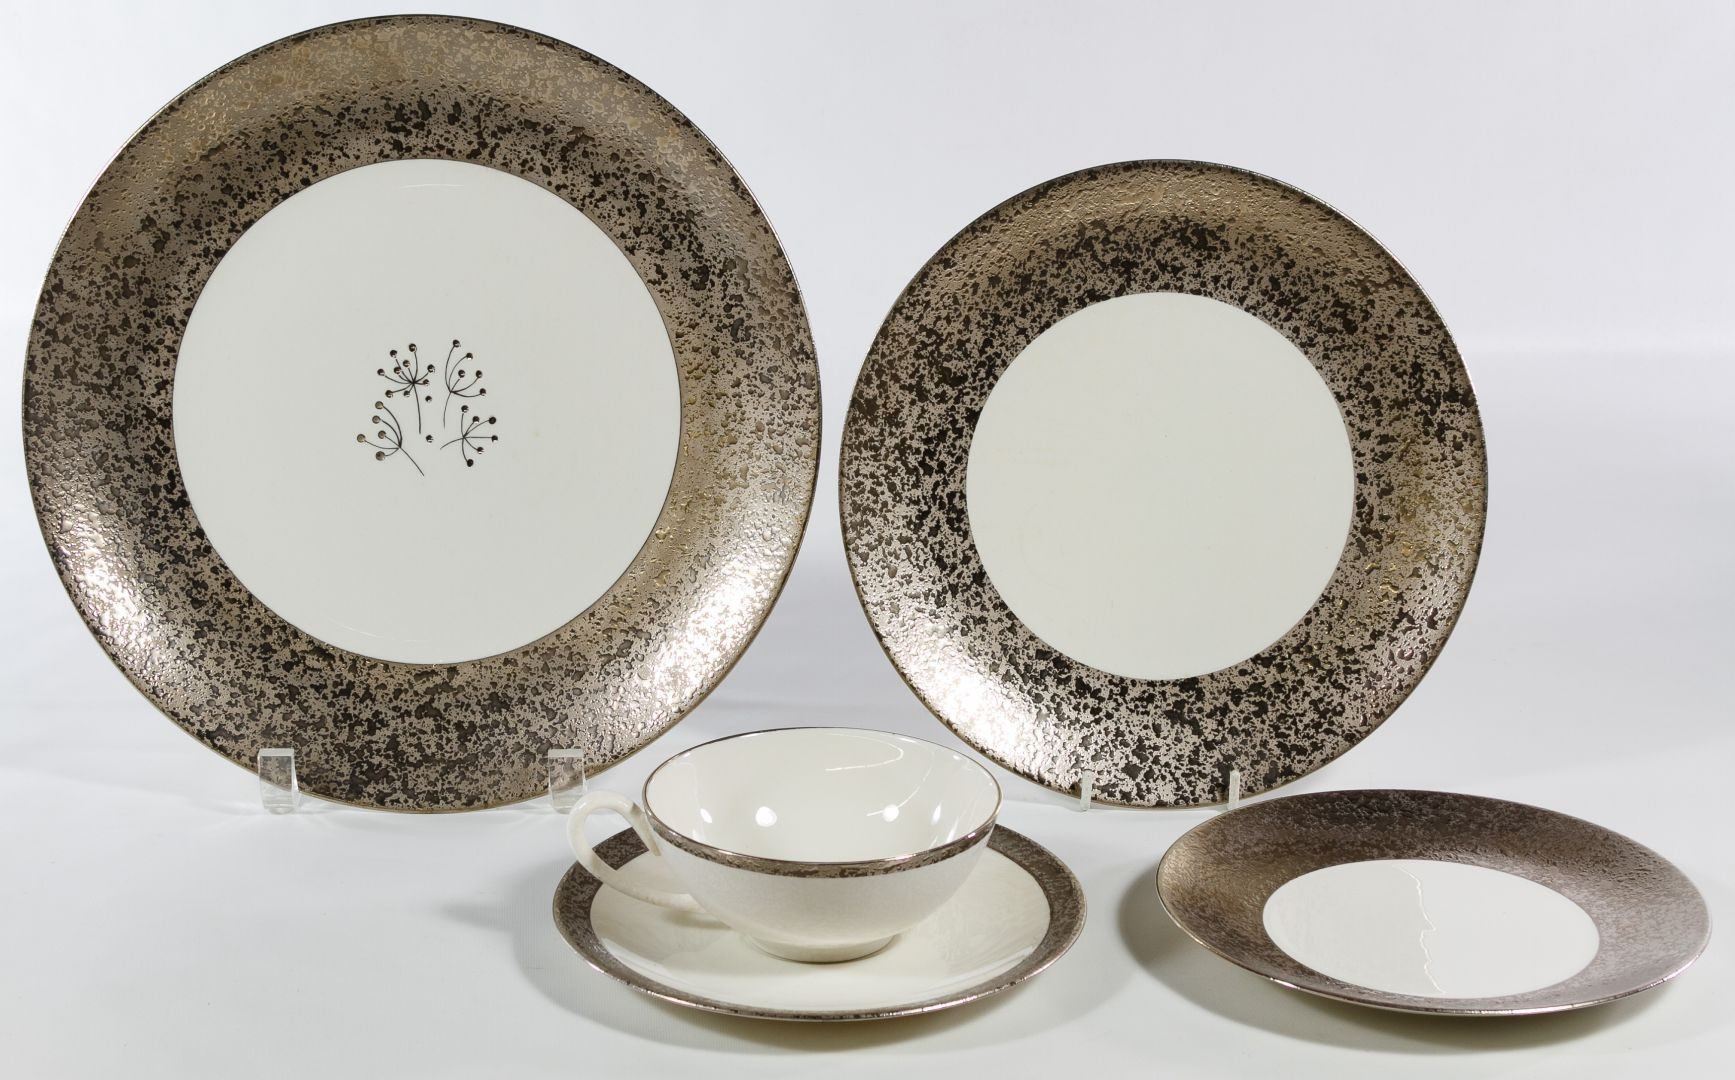 Lot 324 Sasha Brastoff \ Winrock\  China Service; Including (11) dinner · Dessert PlatesDinner PlatesSalt ... & Lot 324: Sasha Brastoff \